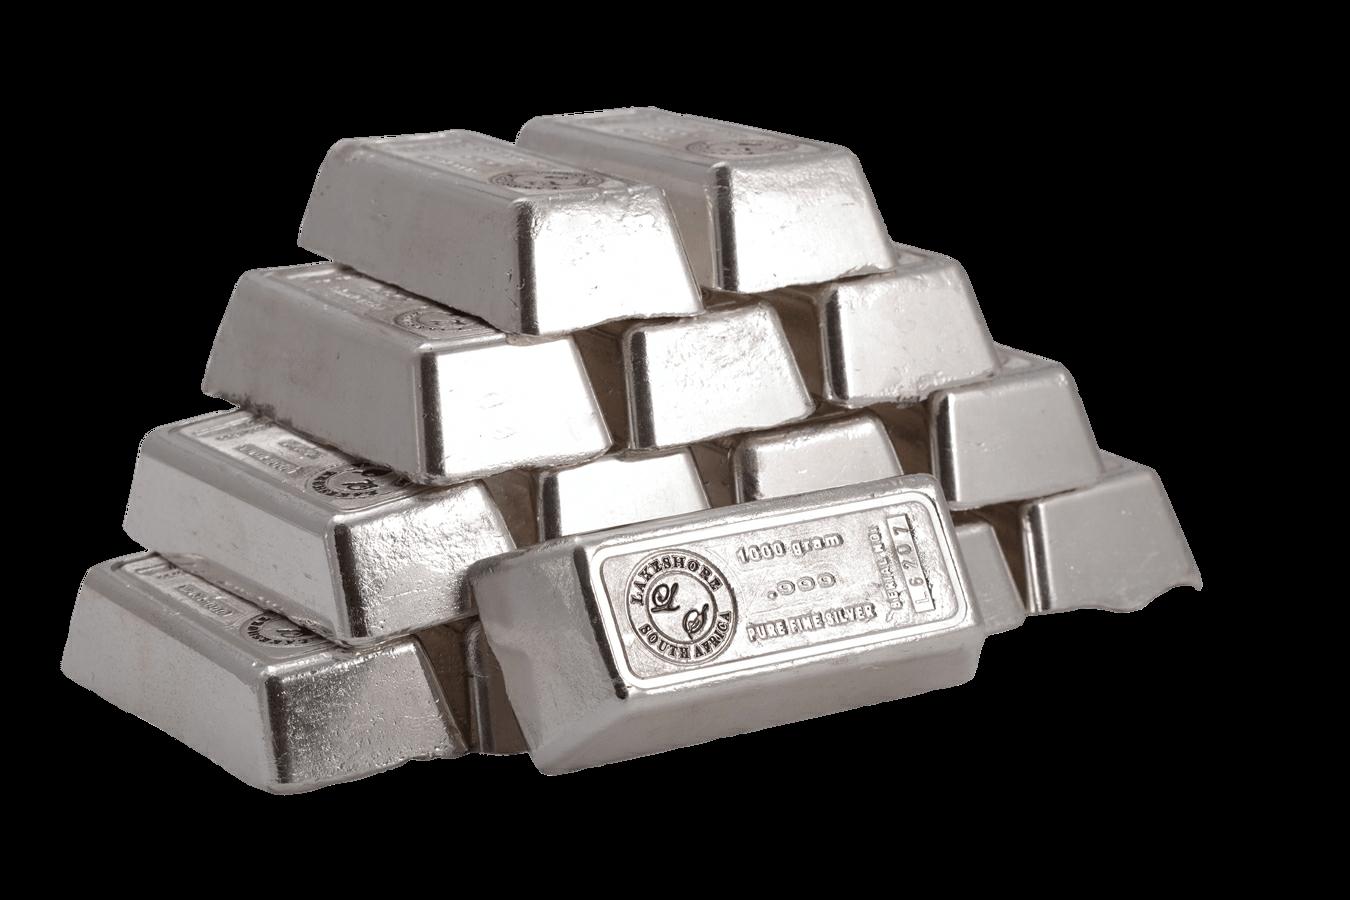 Gold clipart gold ingot. Silver ingots transparent png